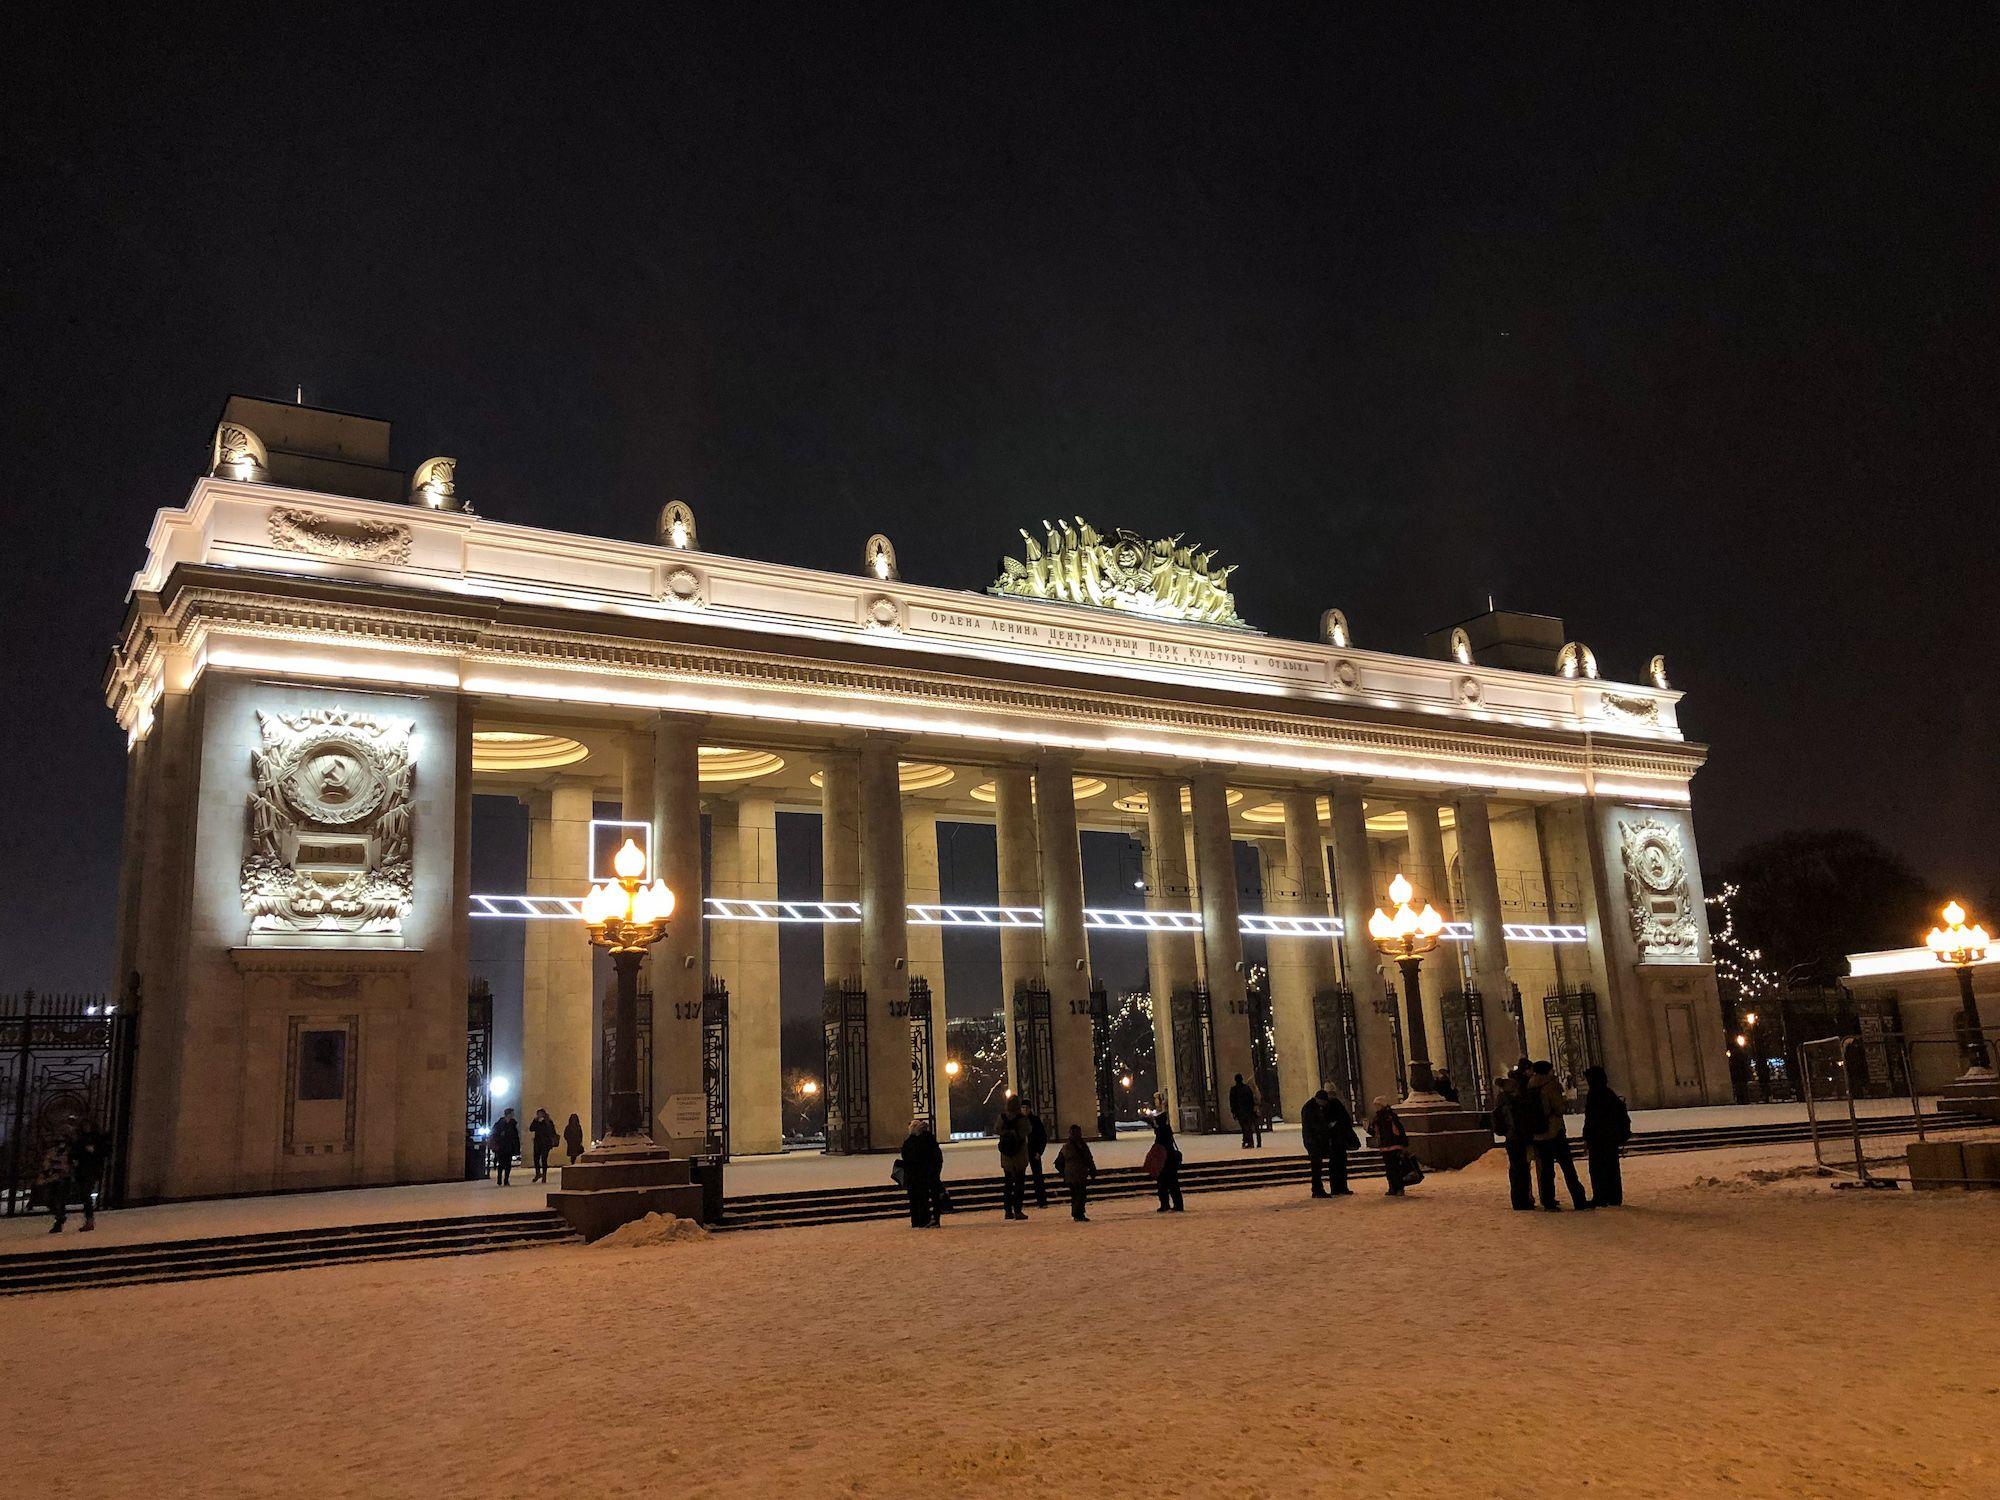 Mosca Gorky Park compressor WEEKEND A MOSCA